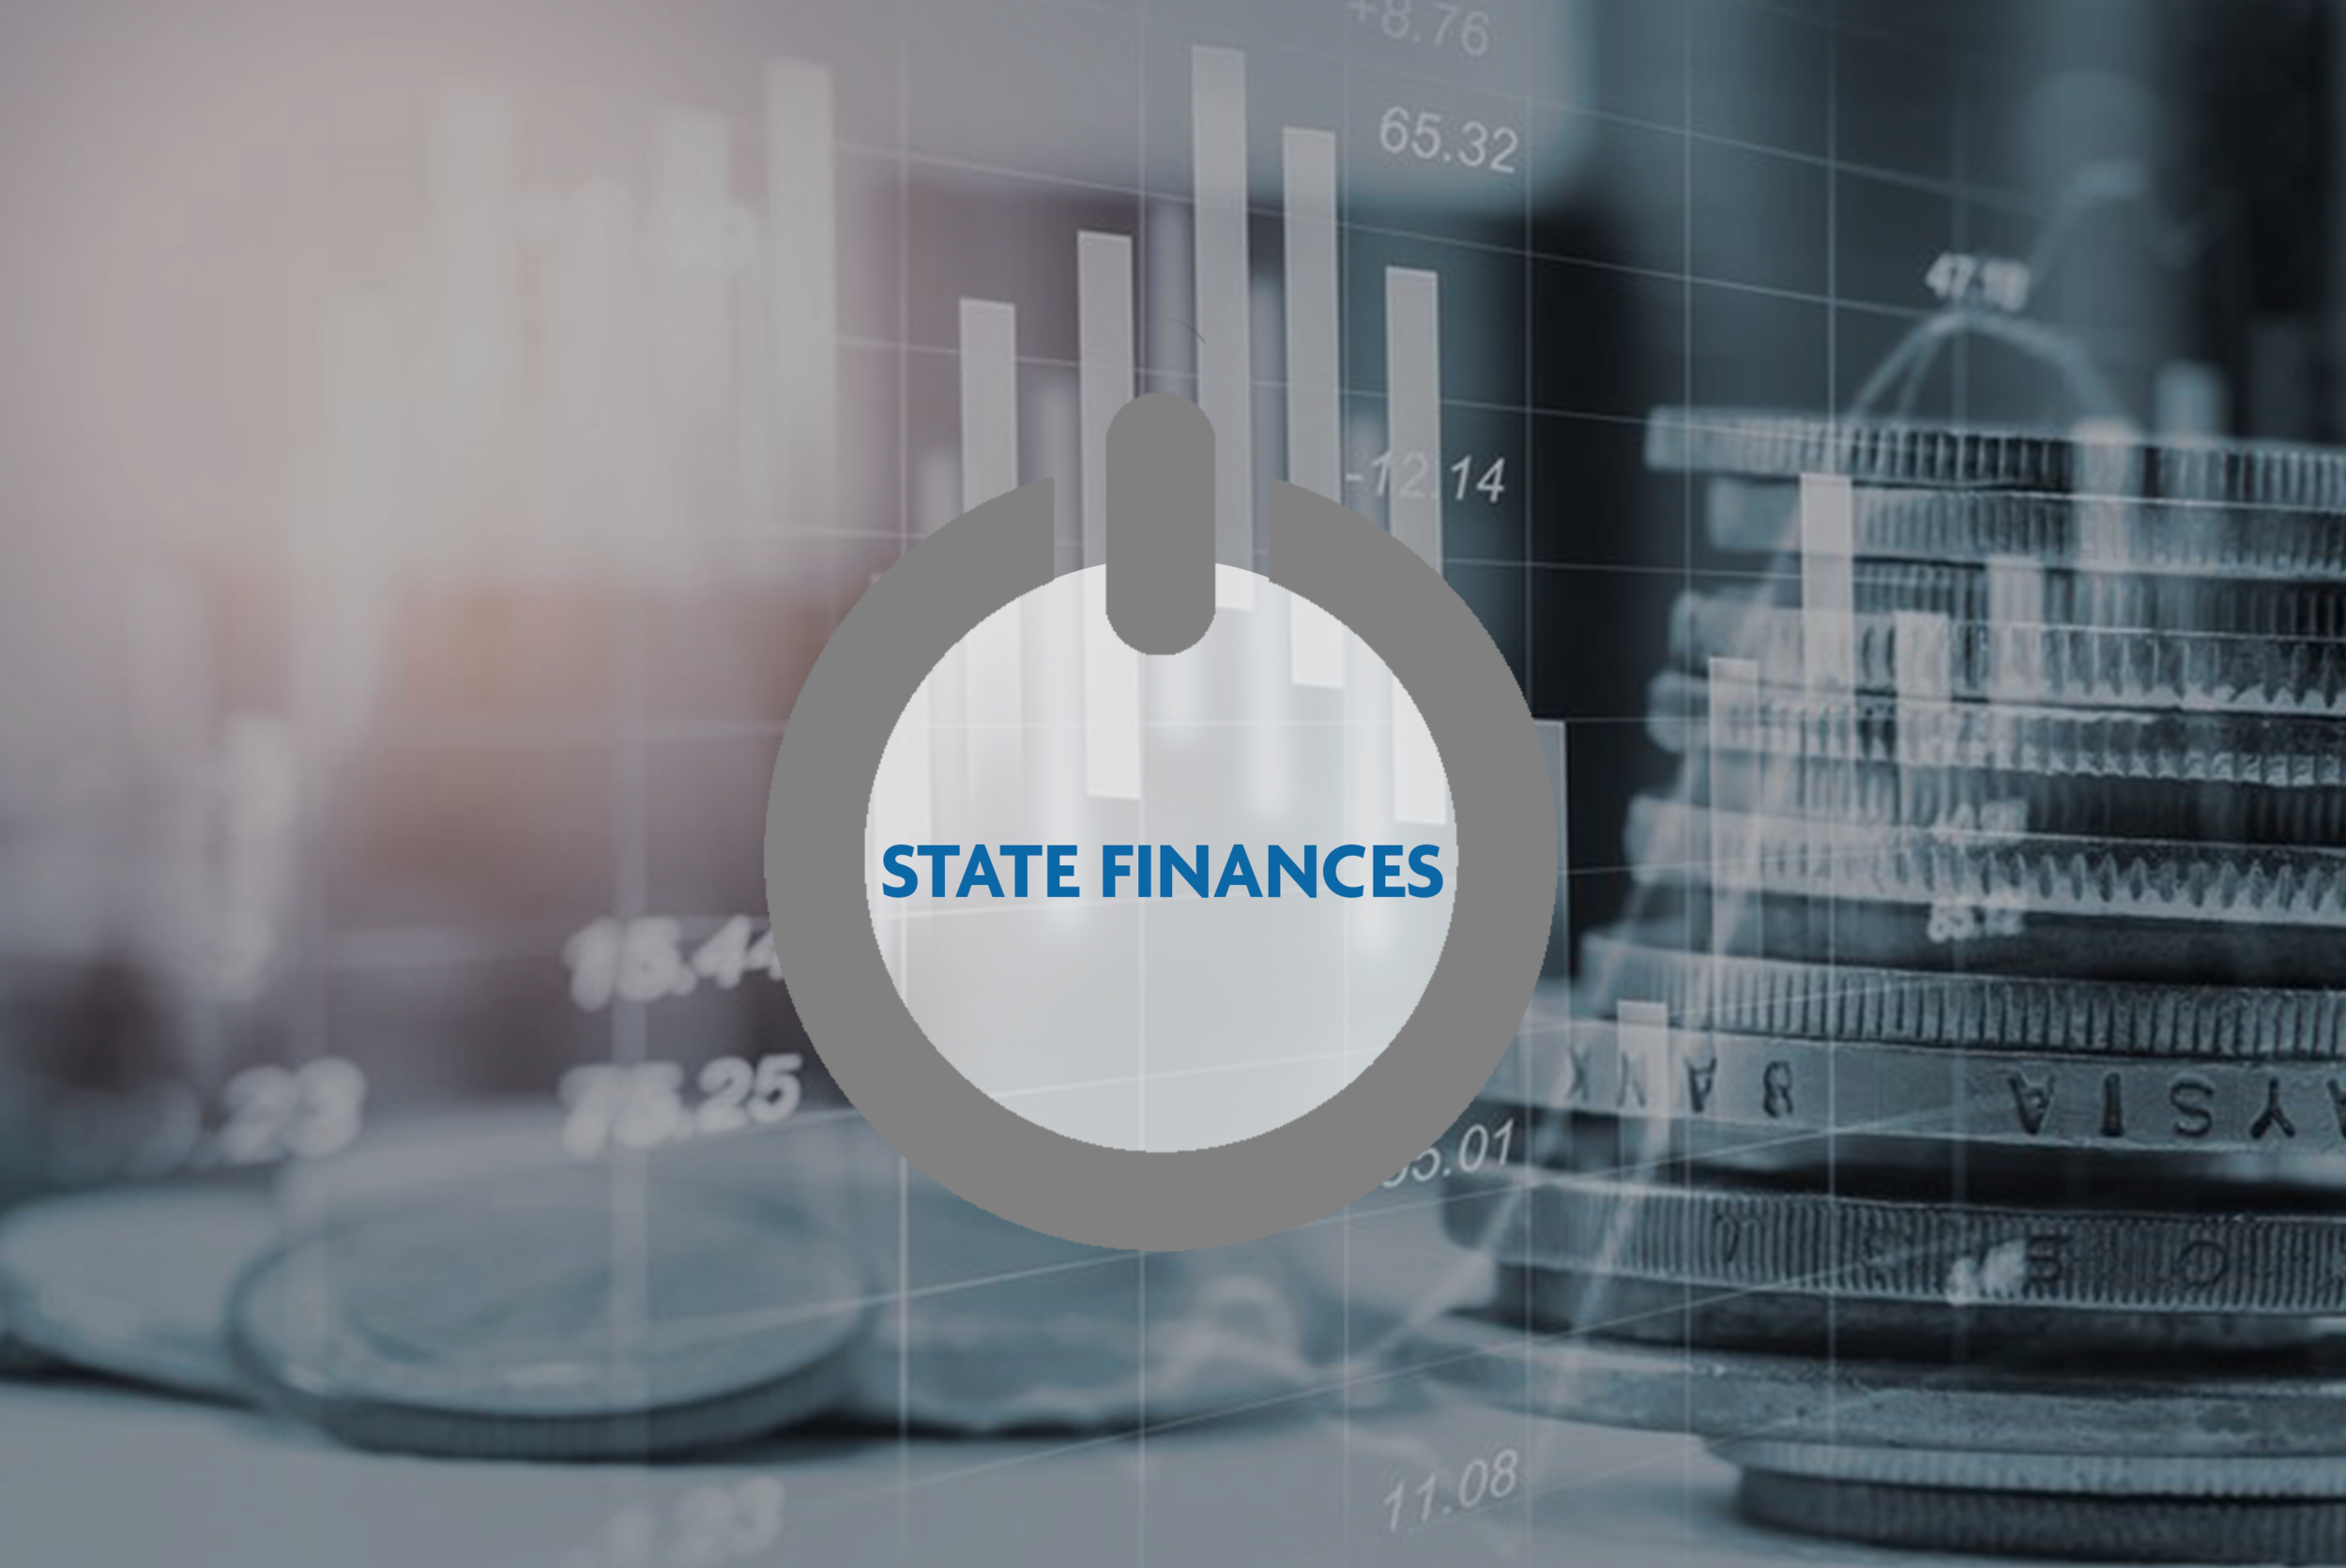 STATE FINANCES